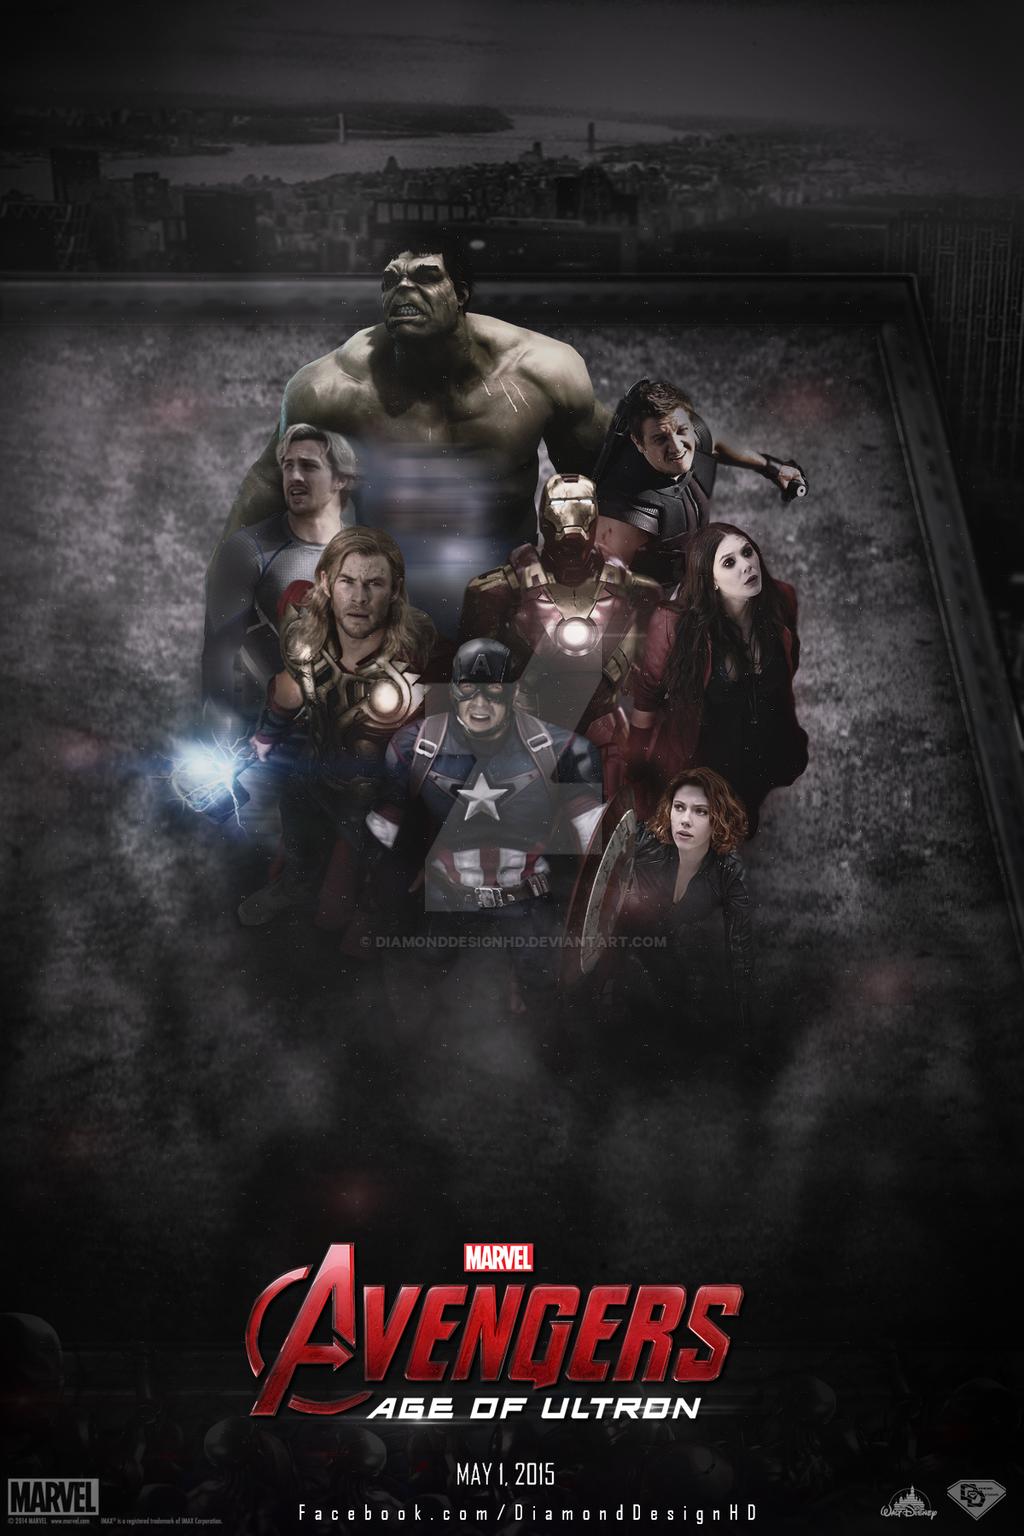 Poster design hd - Diamonddesignhd 123 6 Avengers Age Of Ultron Fan Made Poster By Diamonddesignhd